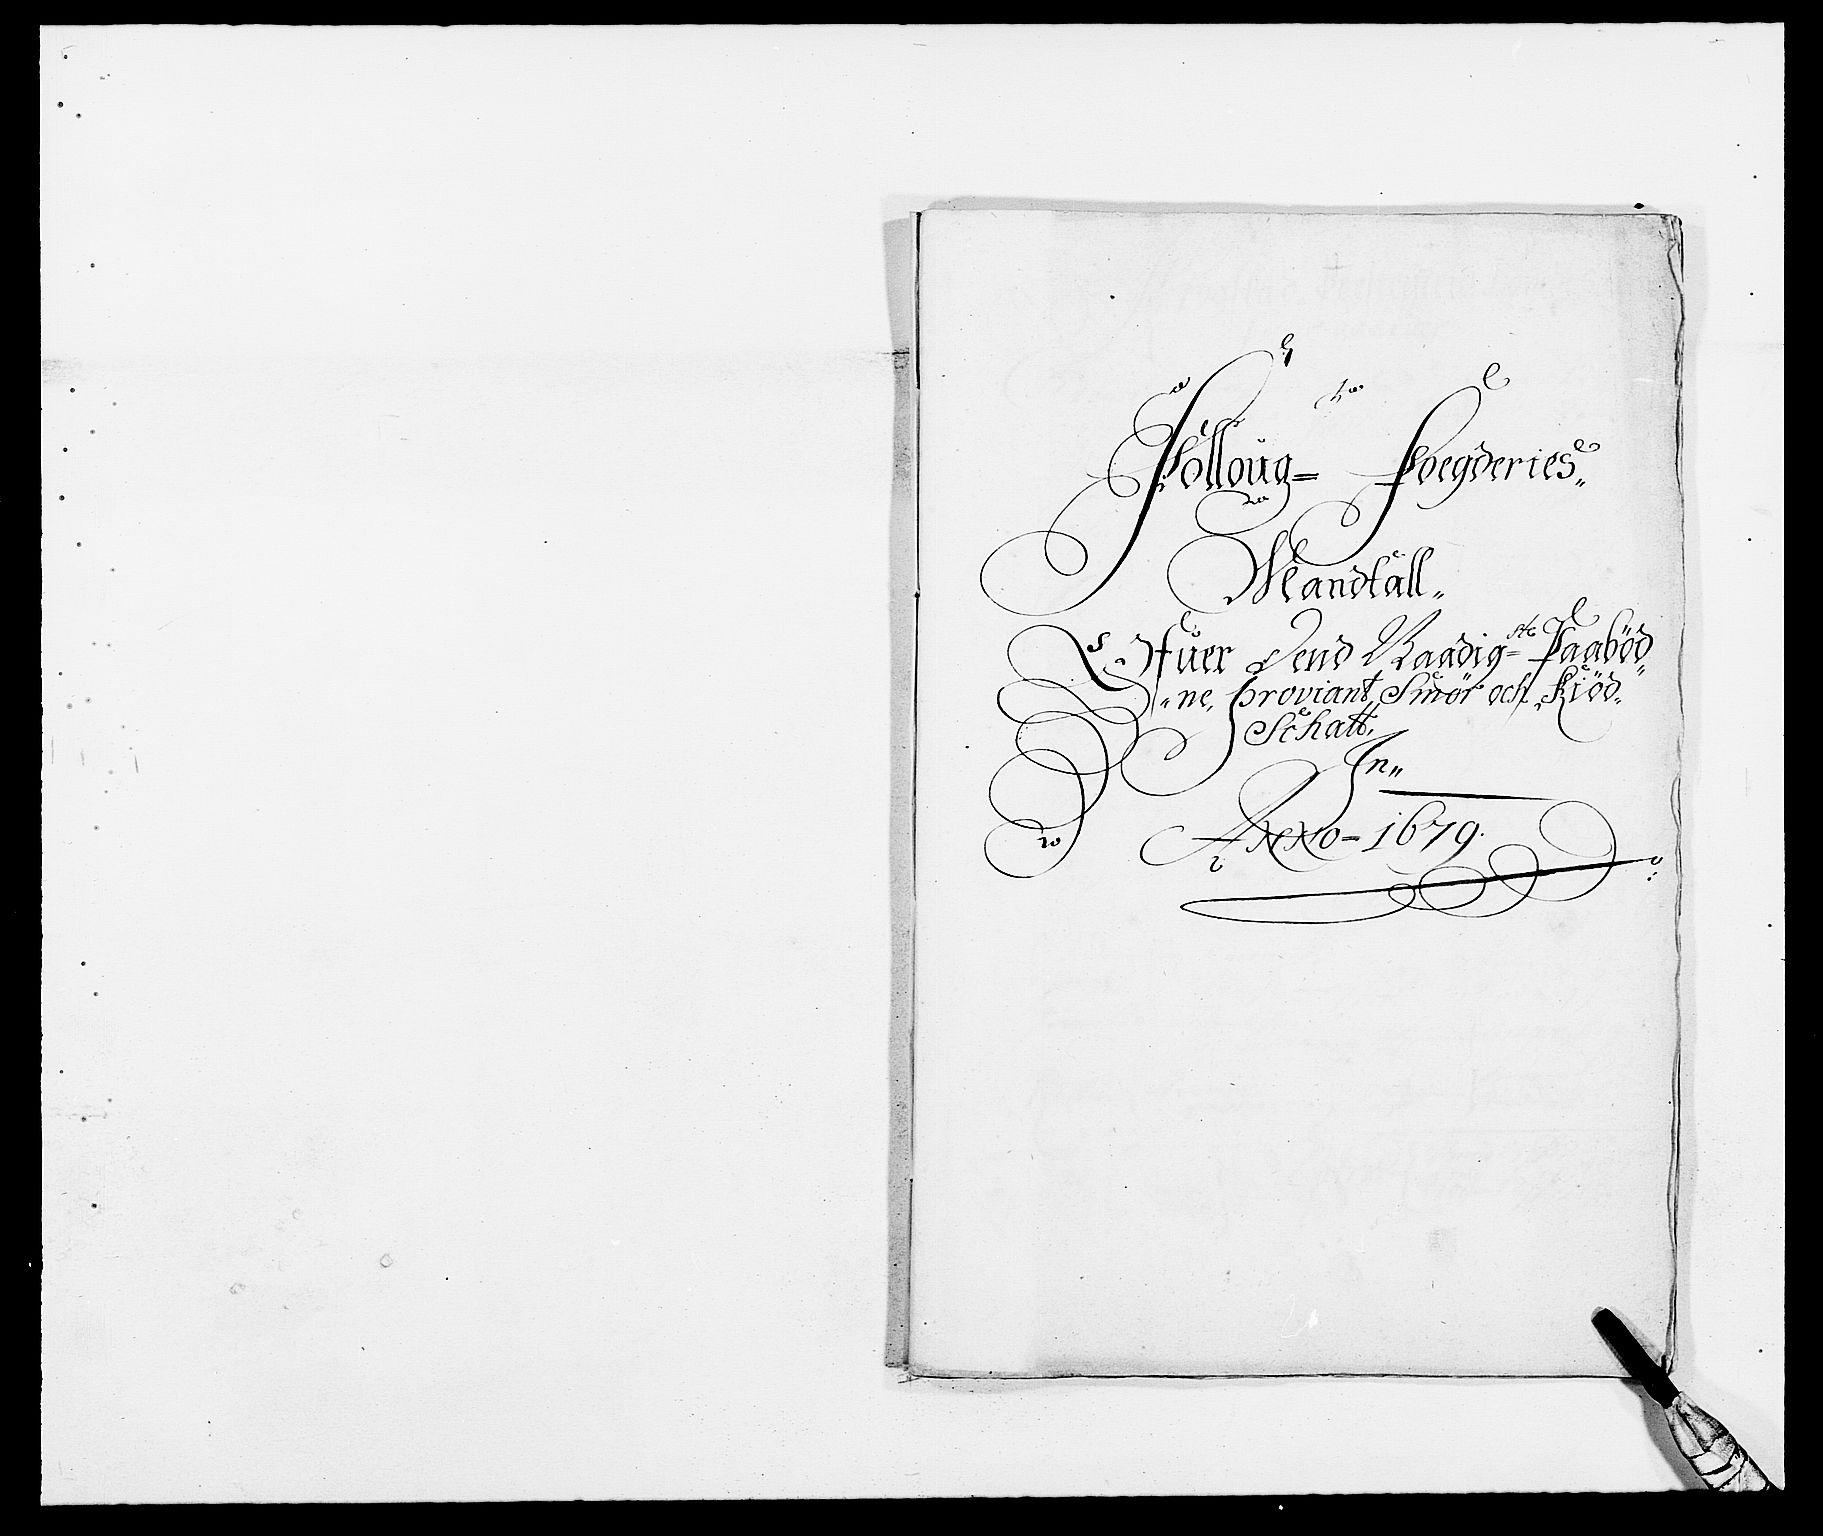 RA, Rentekammeret inntil 1814, Reviderte regnskaper, Fogderegnskap, R09/L0428: Fogderegnskap Follo, 1679, s. 168